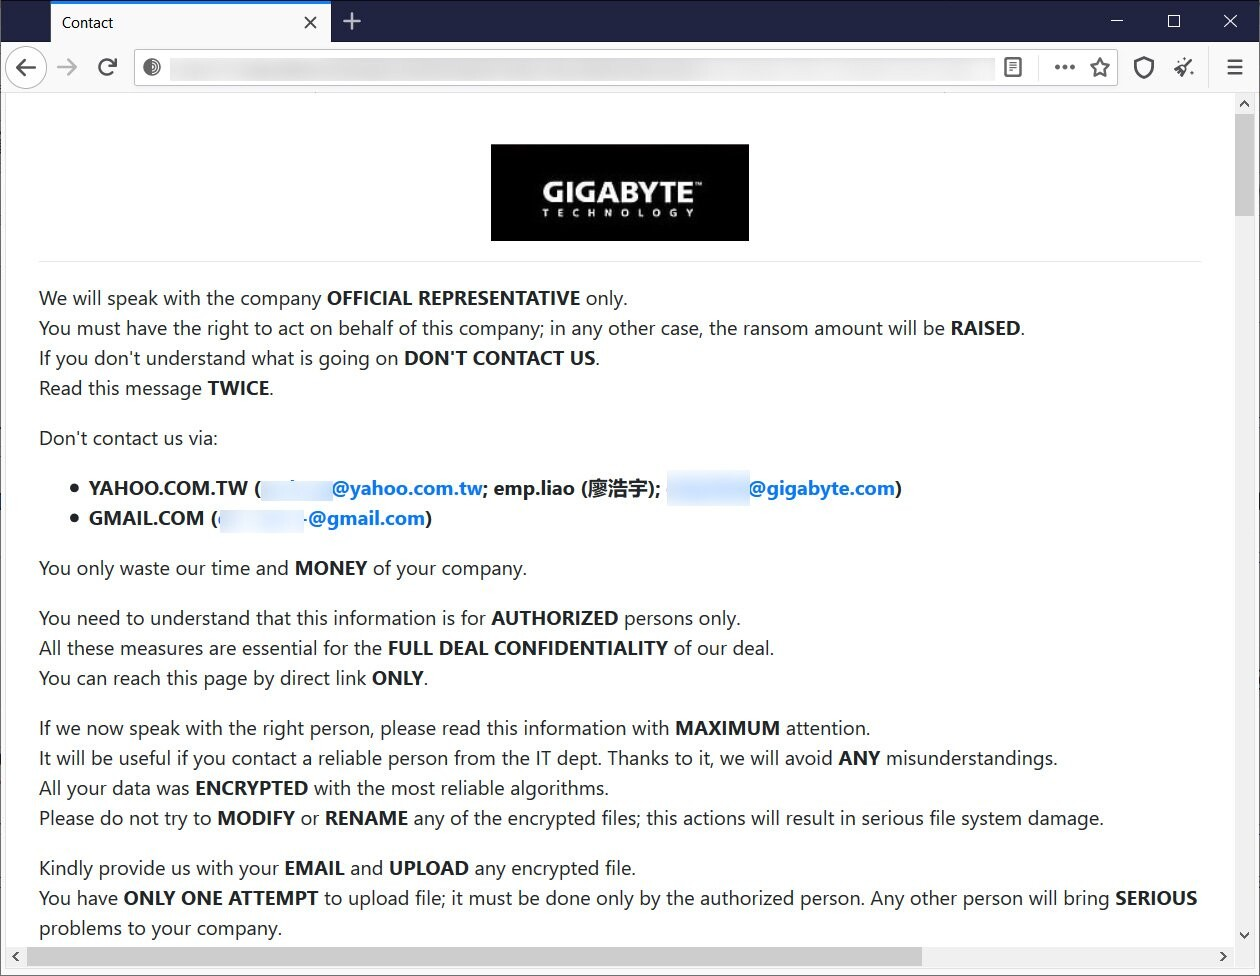 The Threat to GIGABYTE